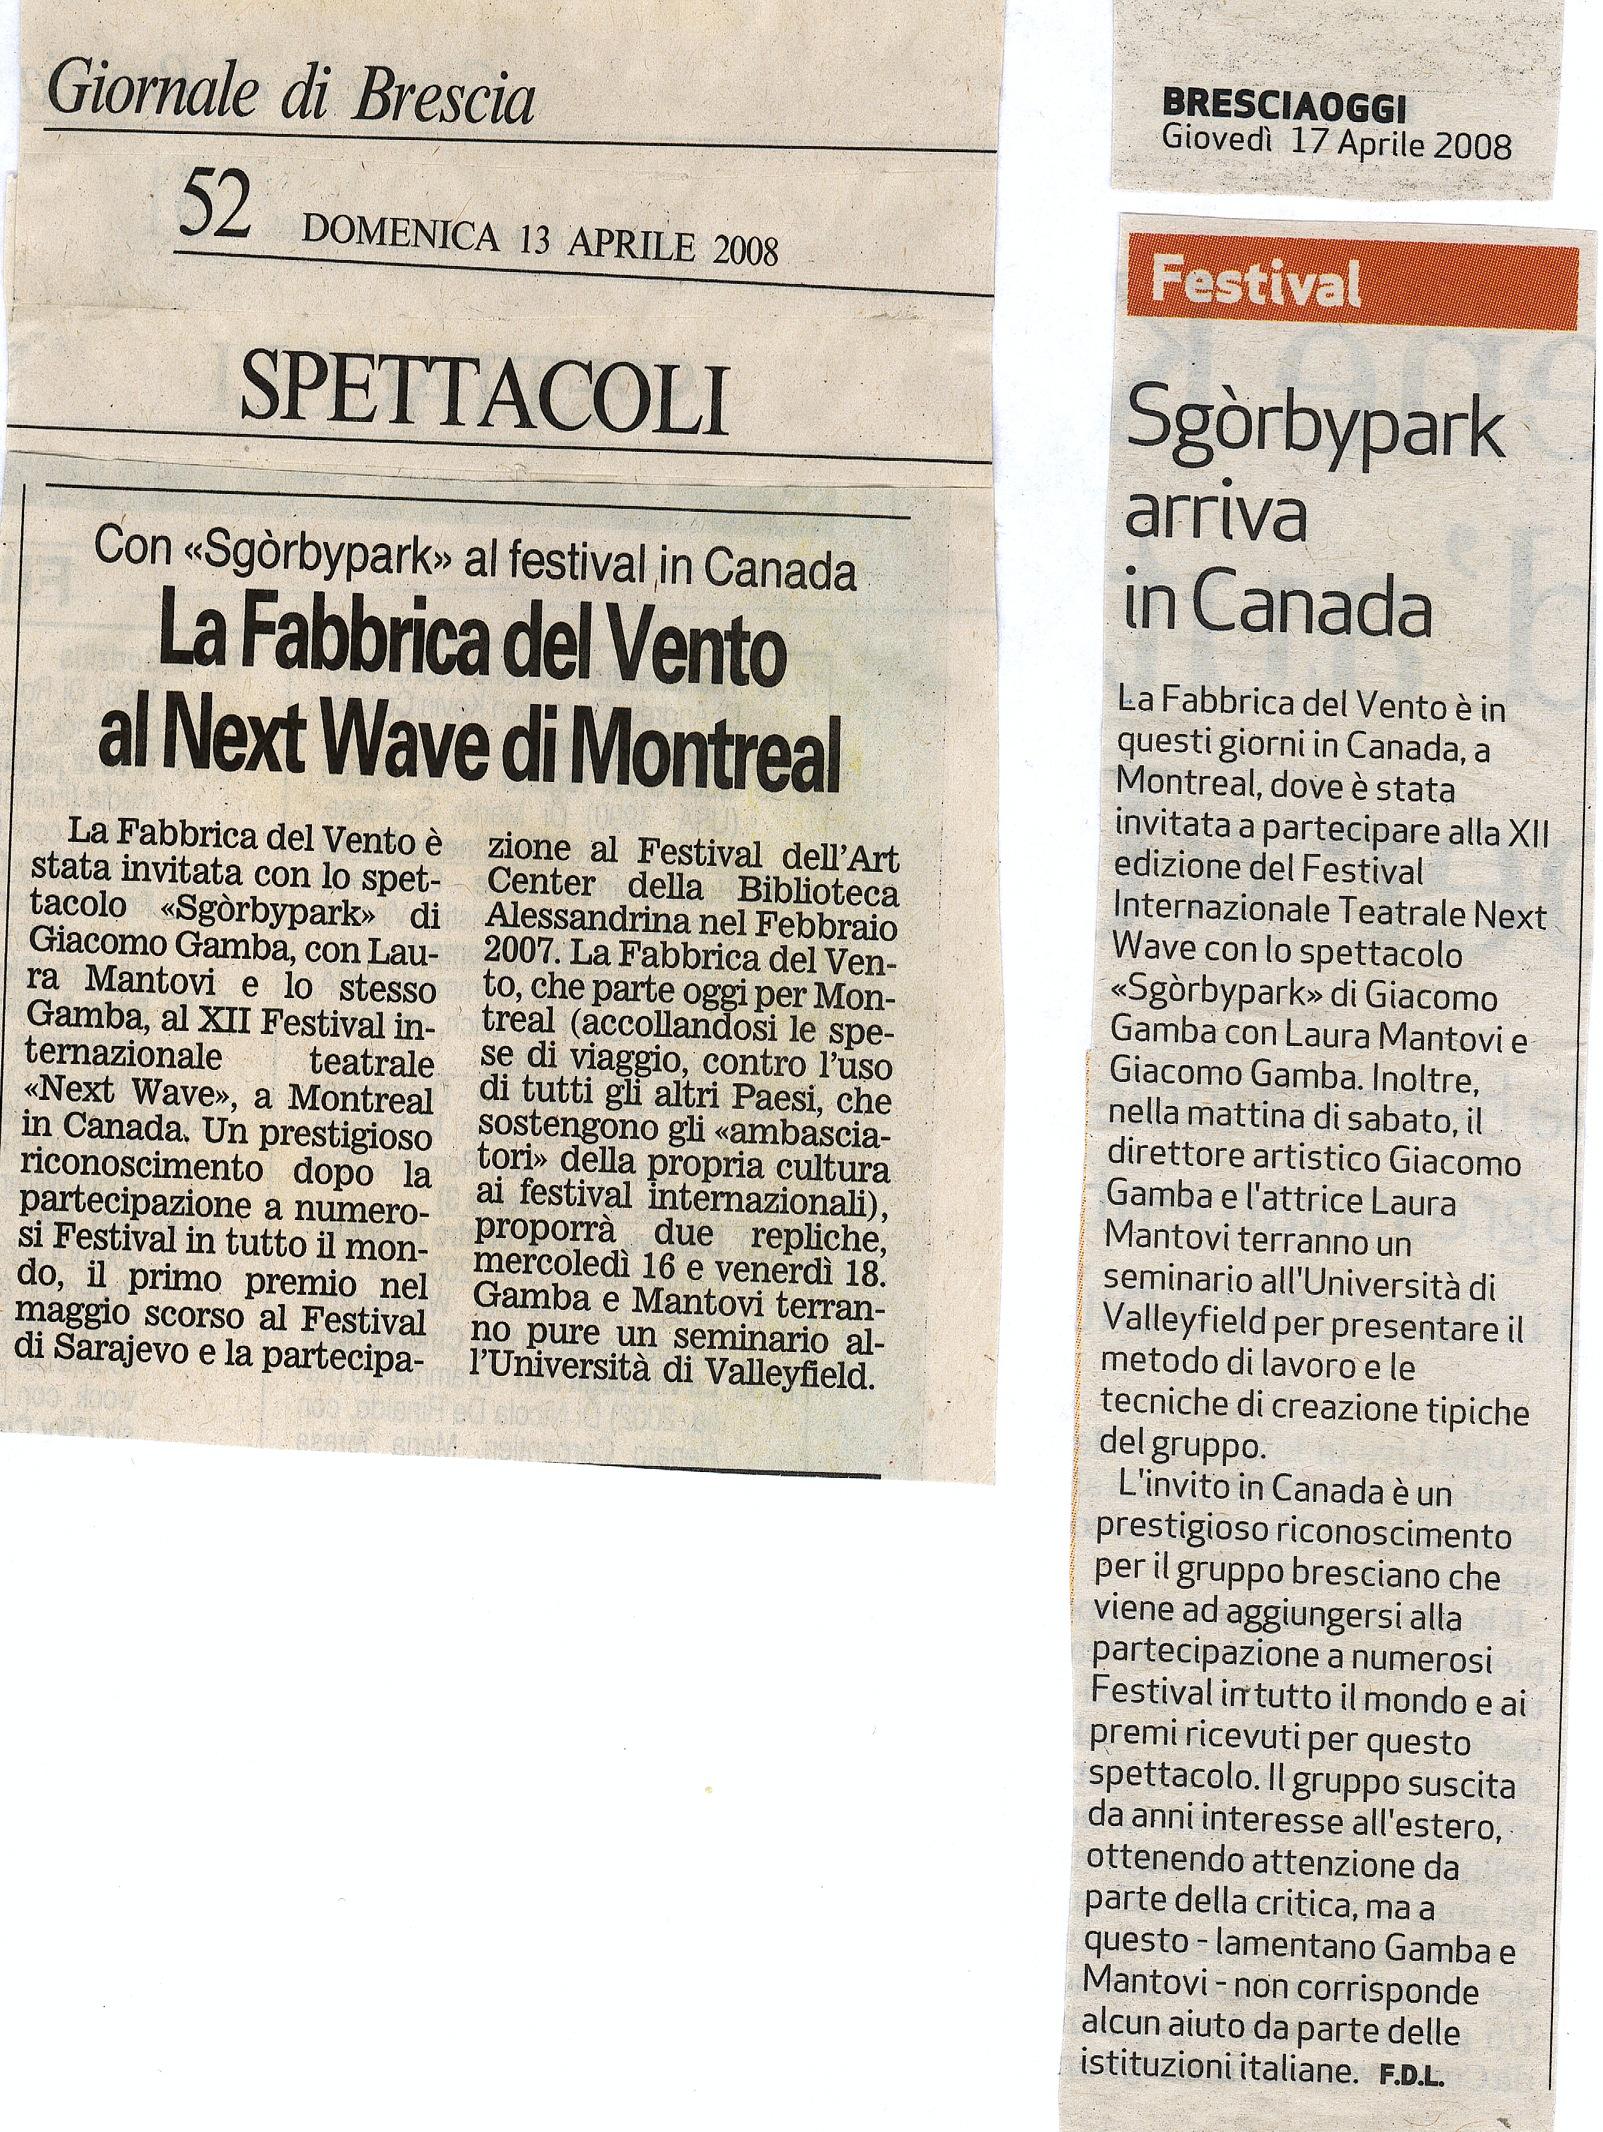 Giacomo Gamba a Montreal